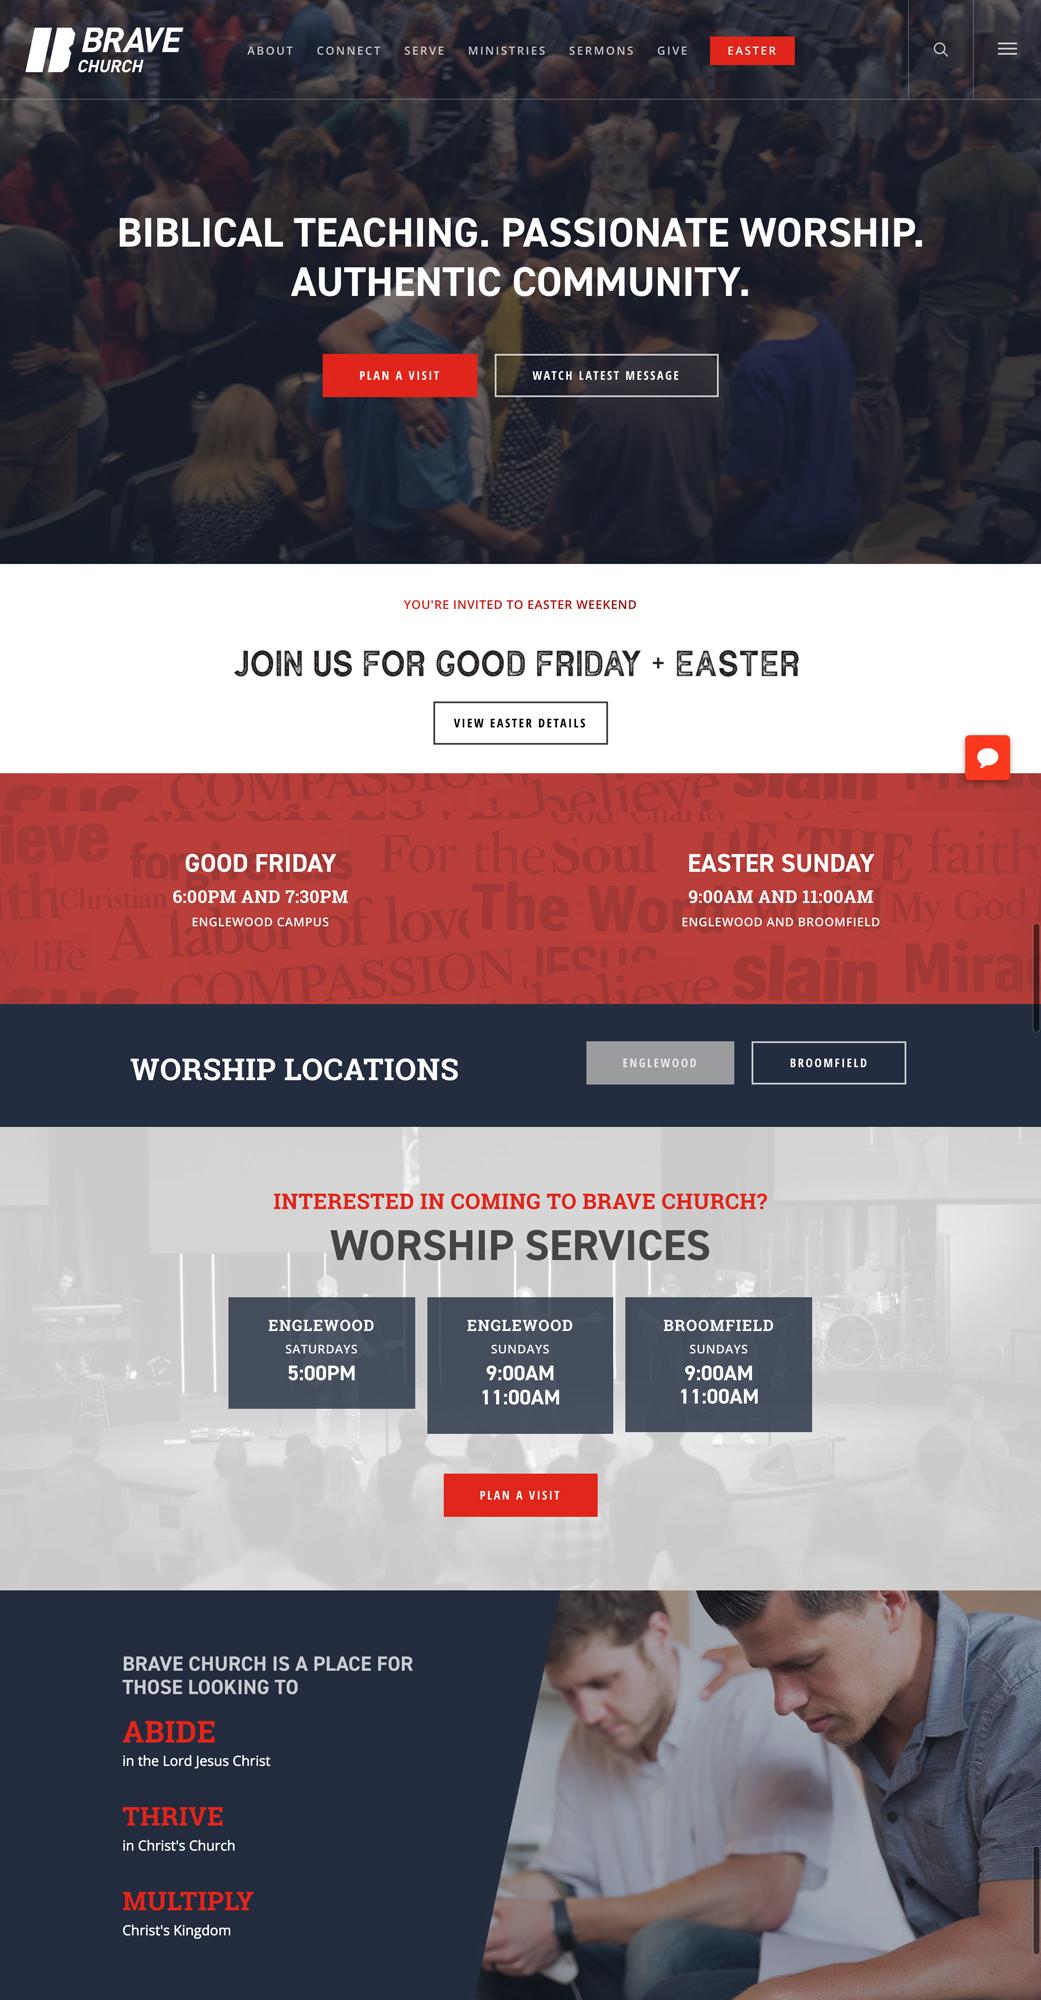 BRAVE Church homepage design